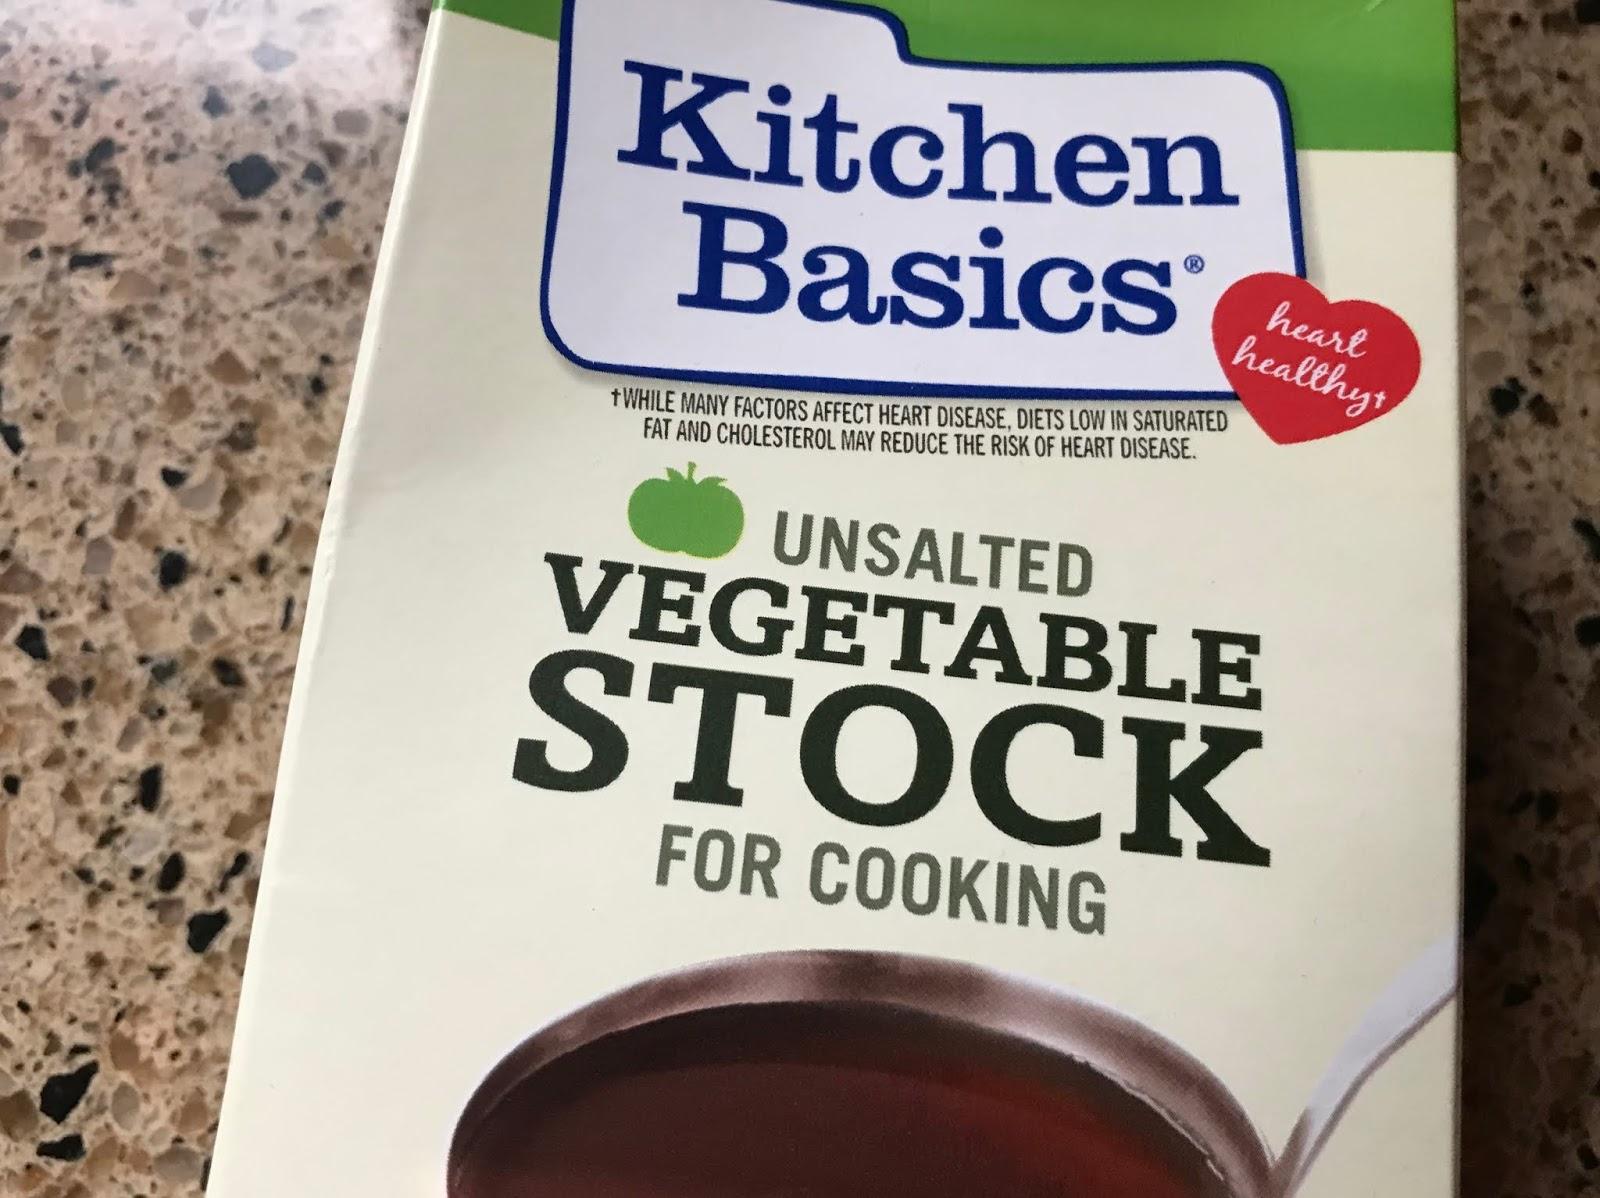 The Grilling Greek Kitchen Basics Unsalted Vegetable Stock